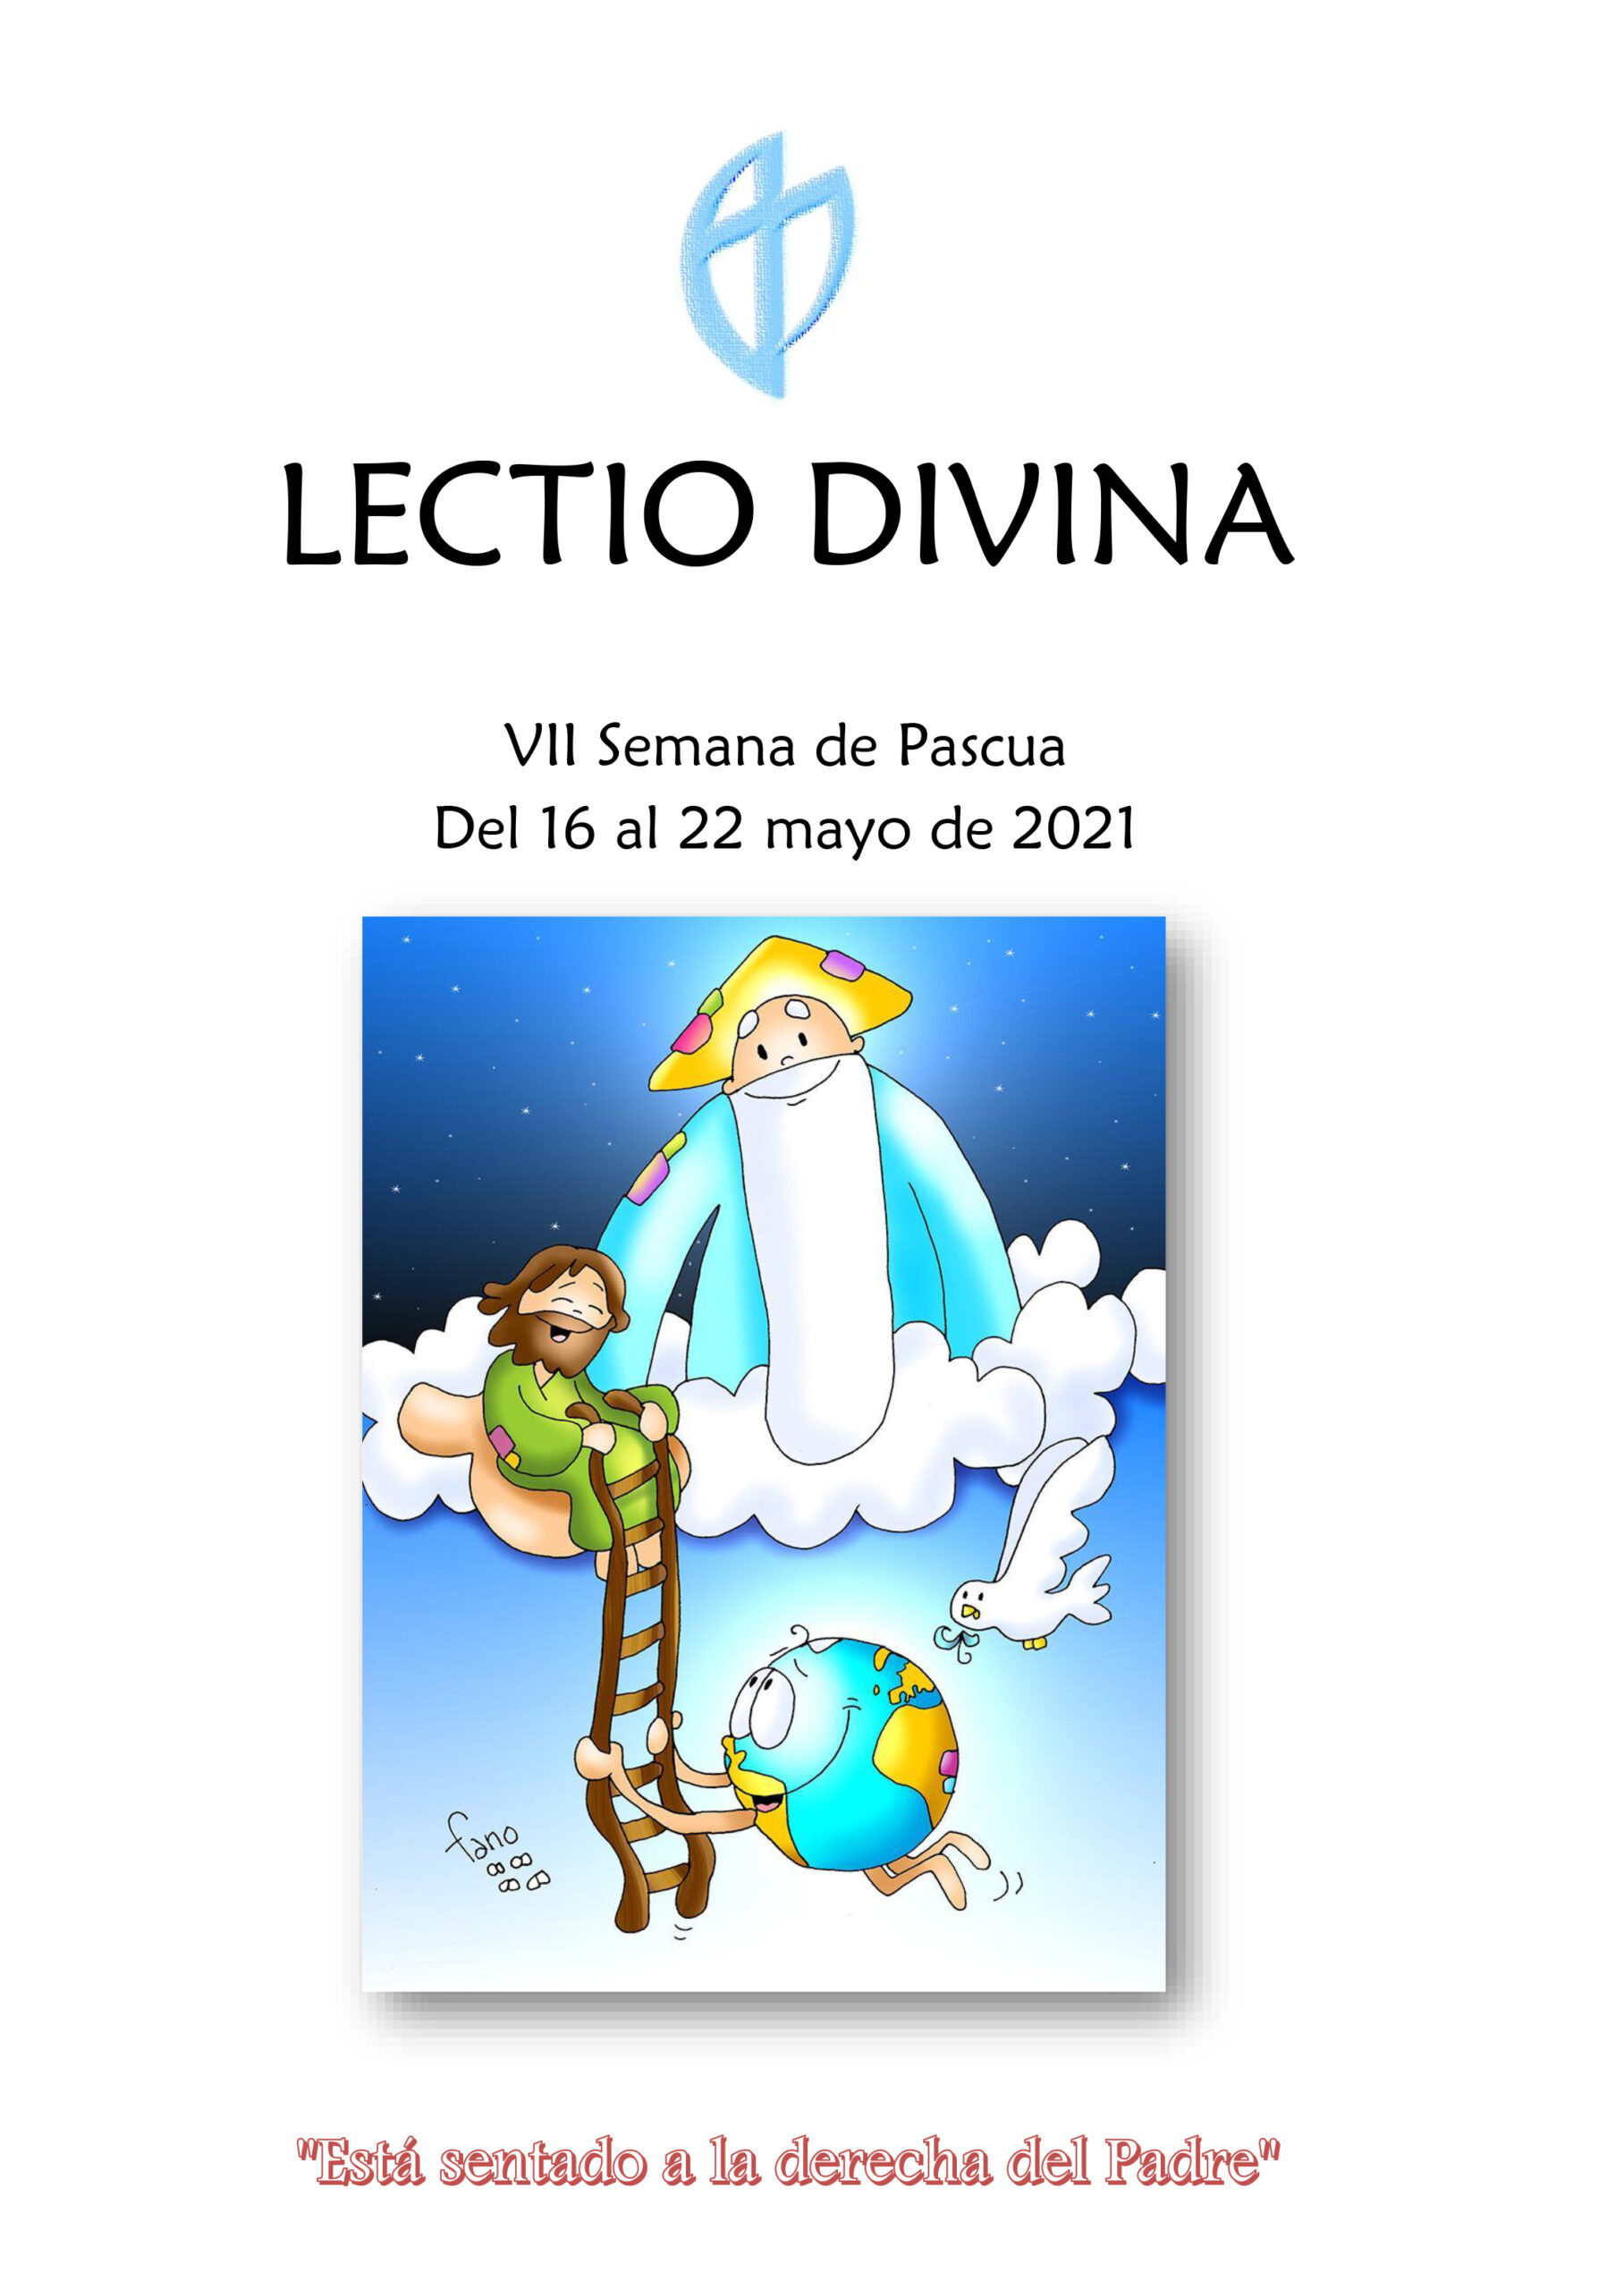 VII Semana de Pascua (del 16 al 22 mayo de 2021)